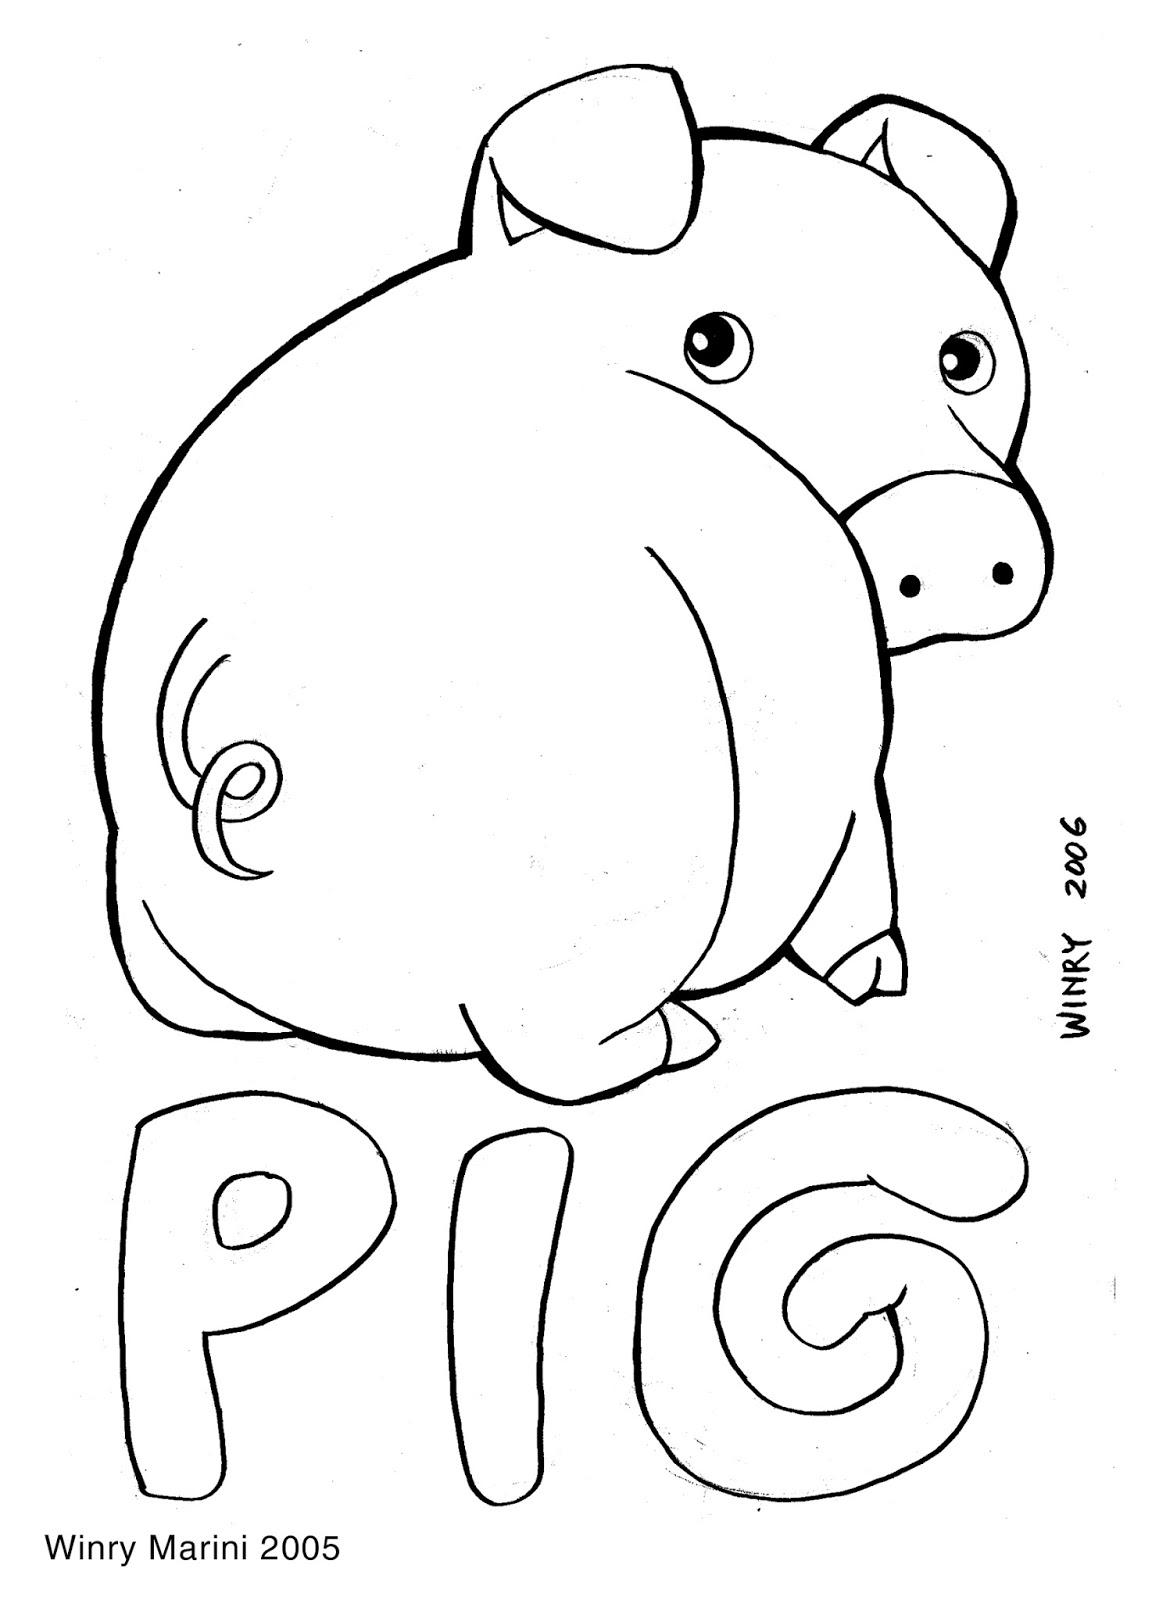 Art And Lore Animals Coloring Halaman Mewarnai Binatang